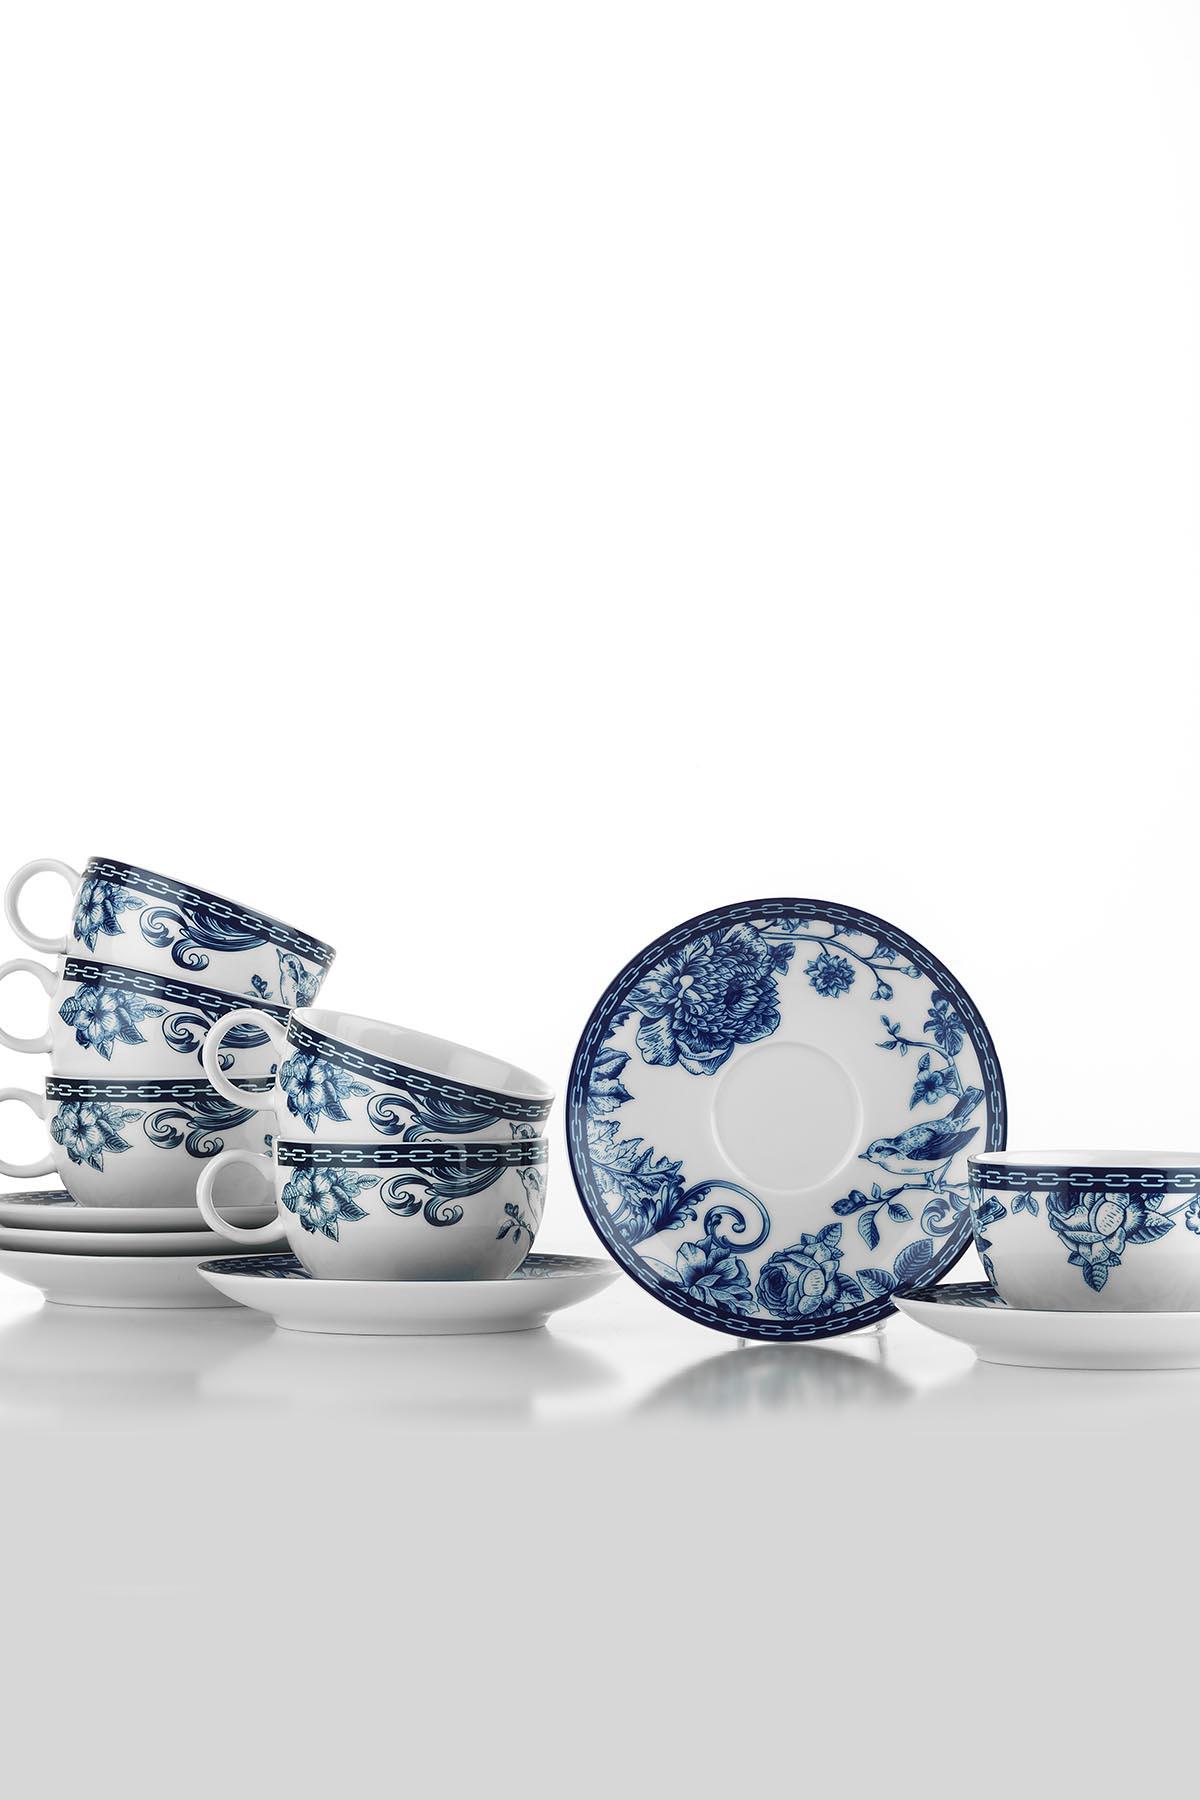 Kütahya Porselen Bleu Blanc Kahve Fincan Takımı 939016